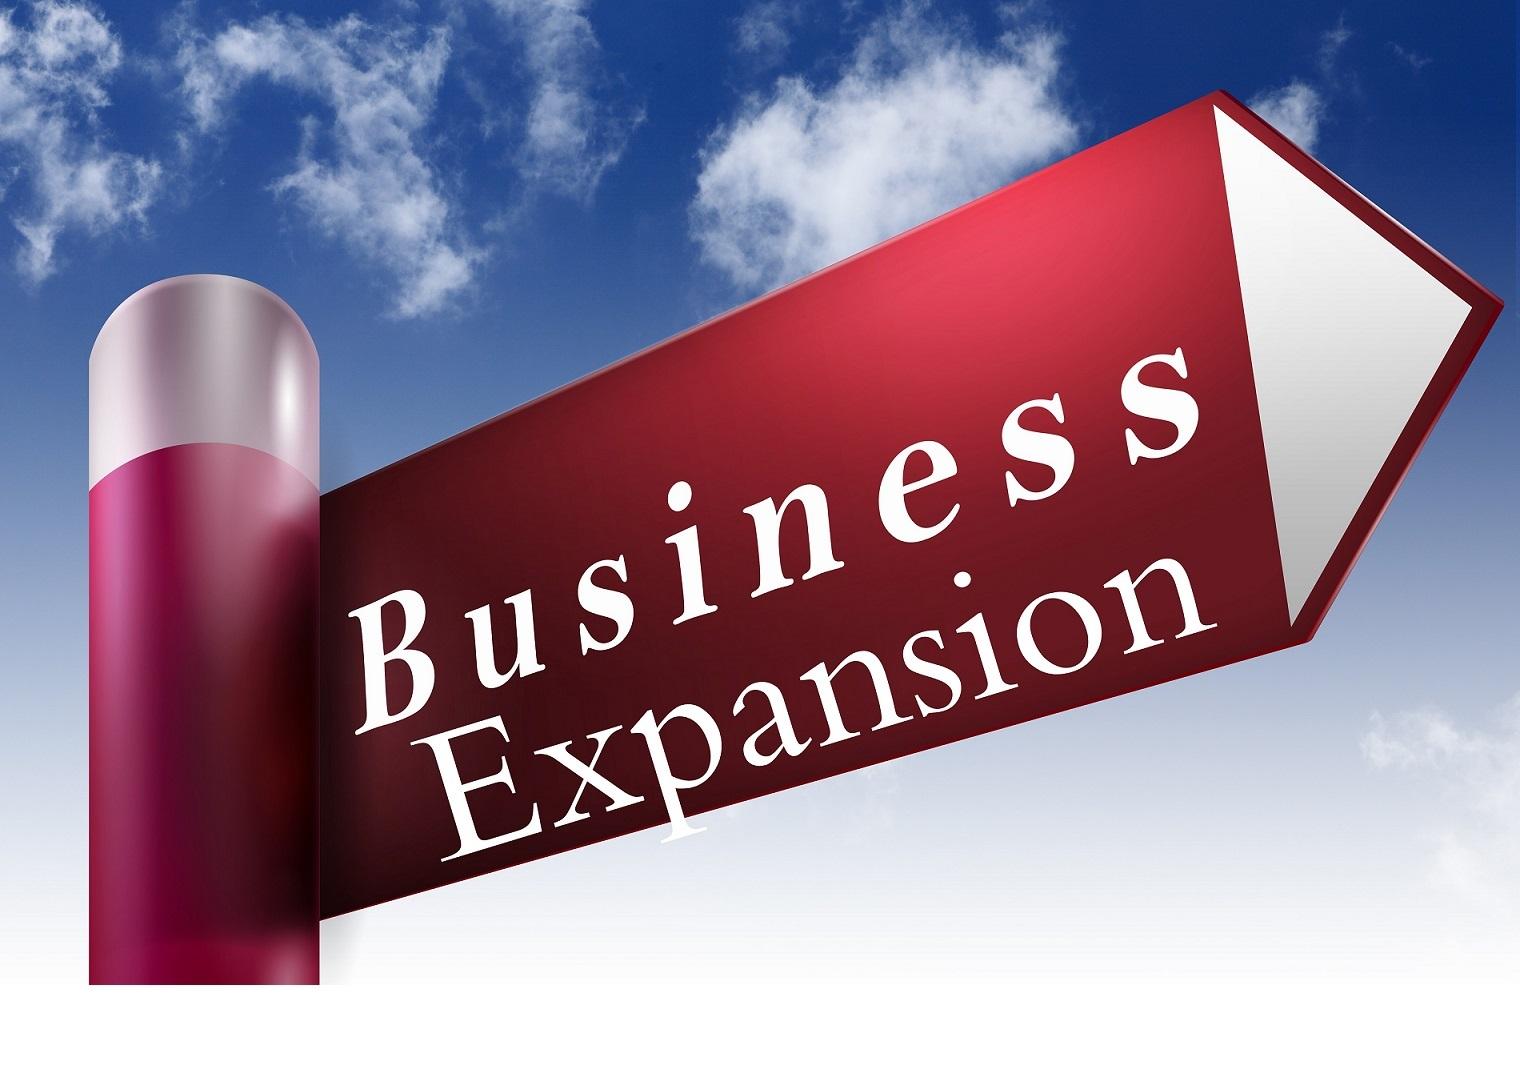 Business expansion plans